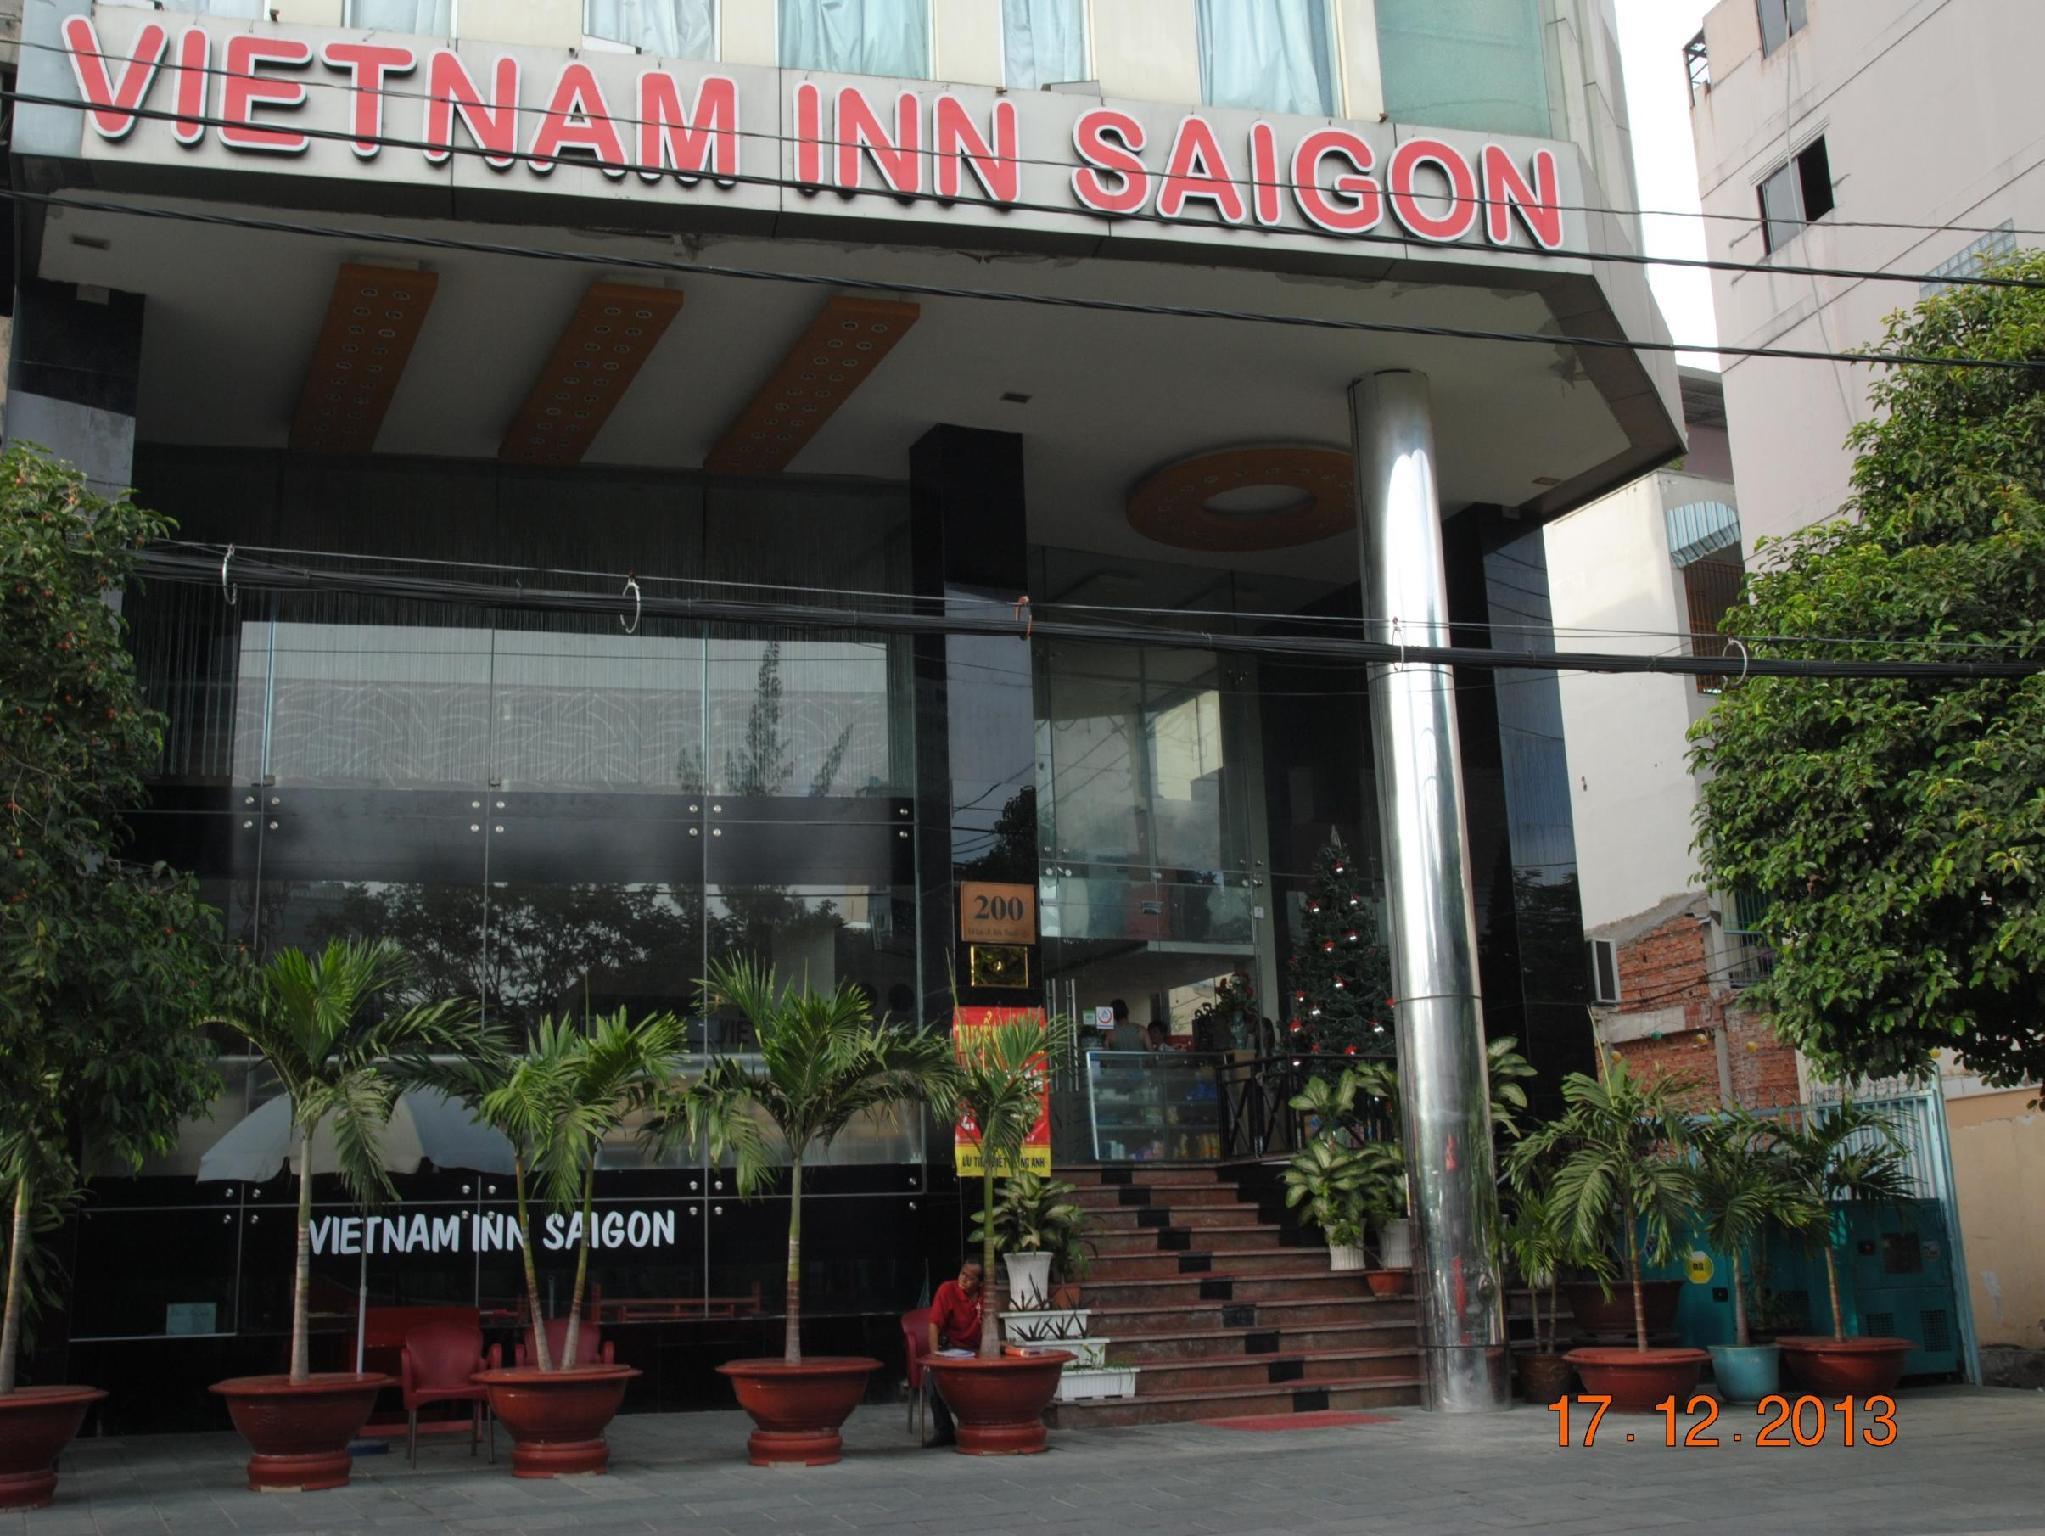 Vietnam Inn Saigon